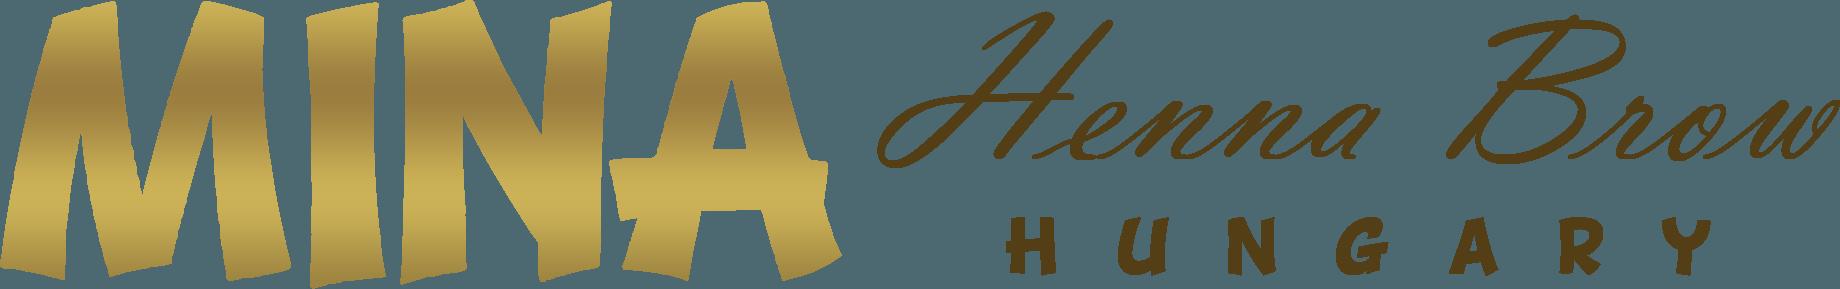 Mina Henna Brow Hungary